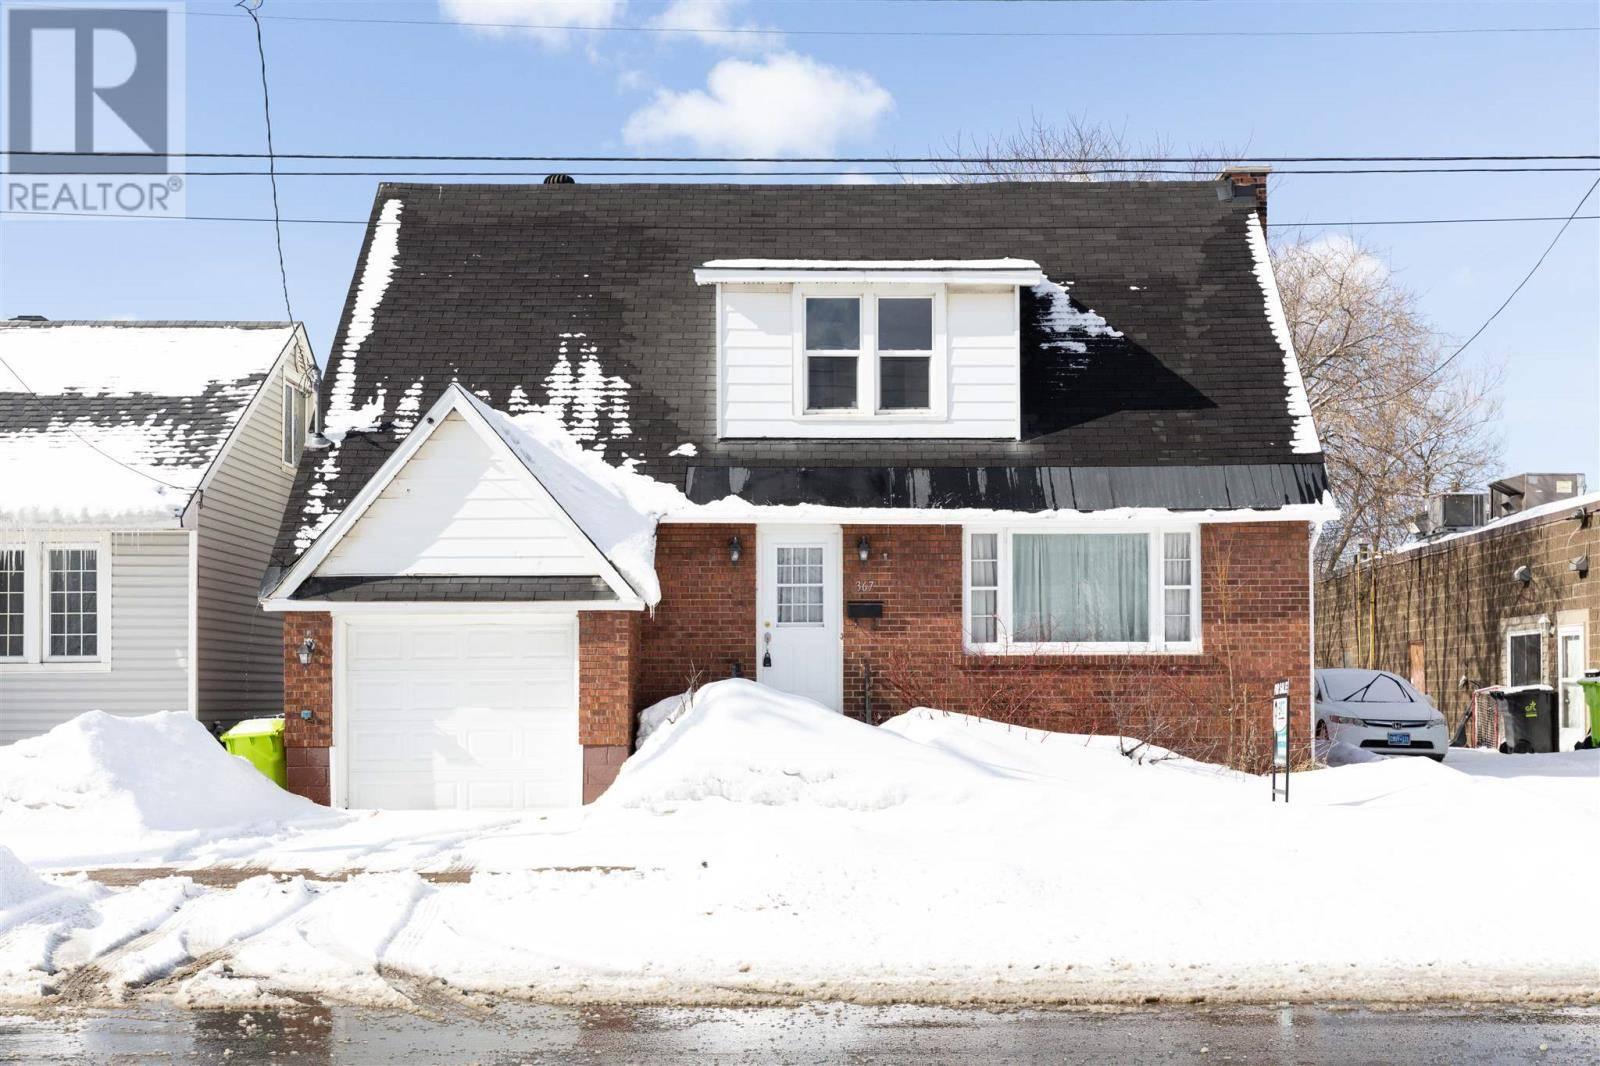 House for sale at 367 Korah Rd Sault Ste. Marie Ontario - MLS: SM127669